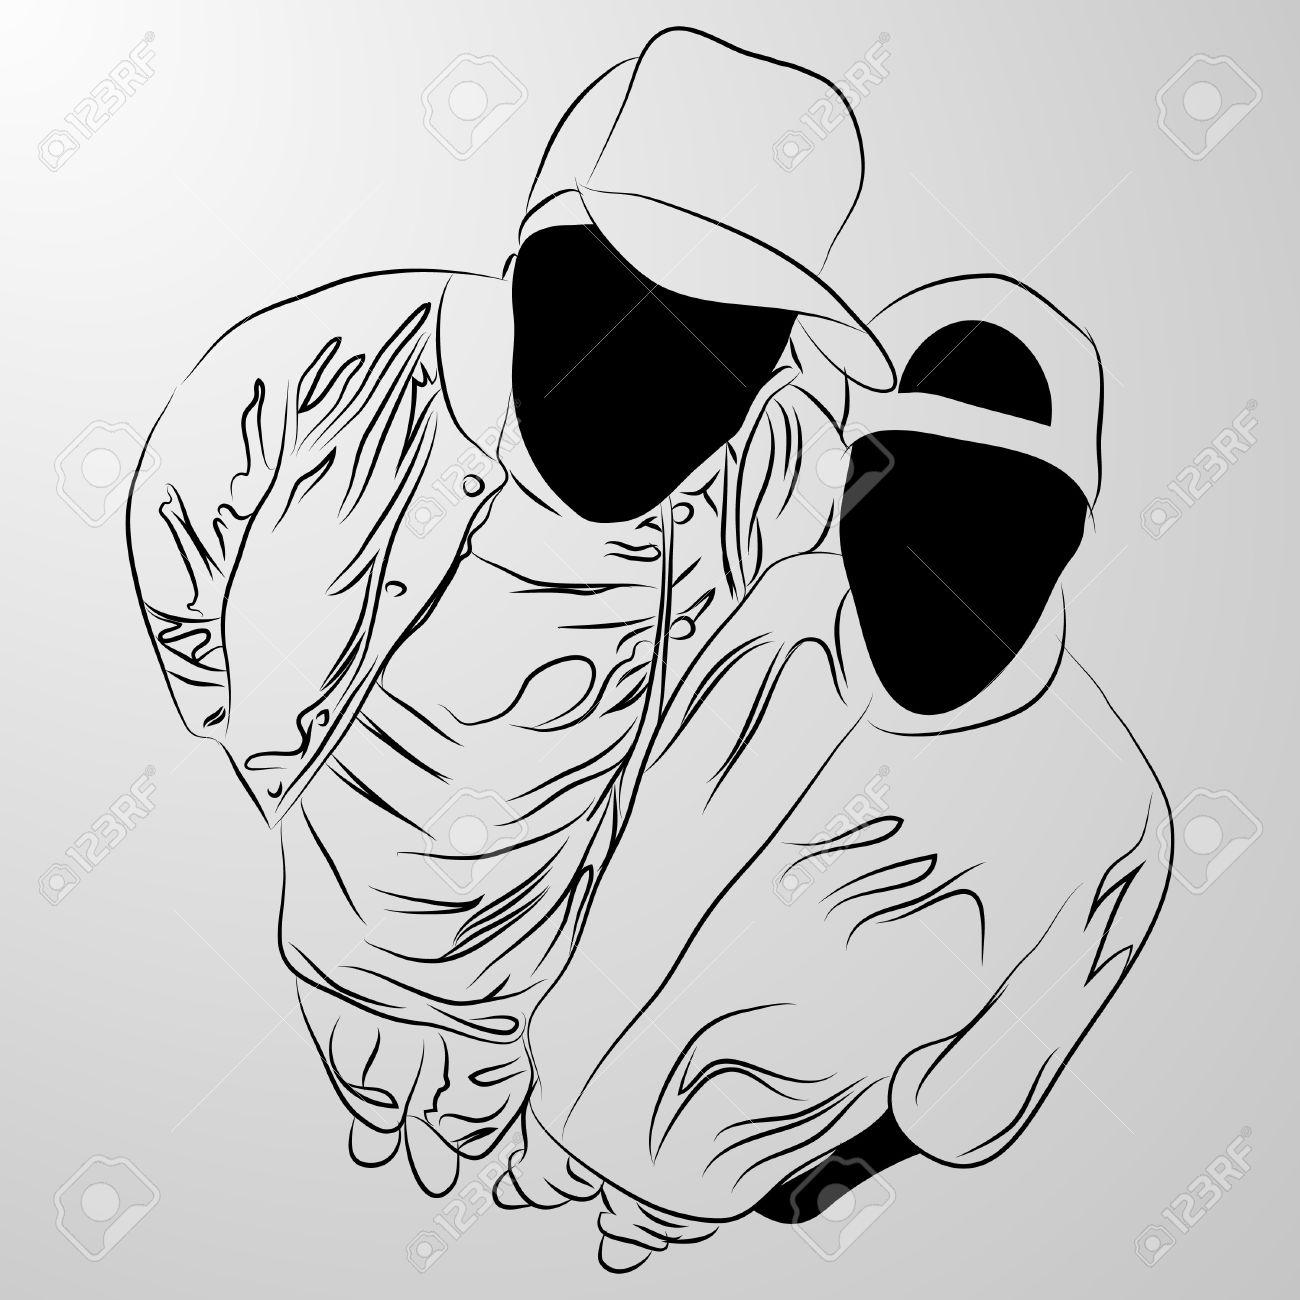 black man on white background (illustration) - 7830399